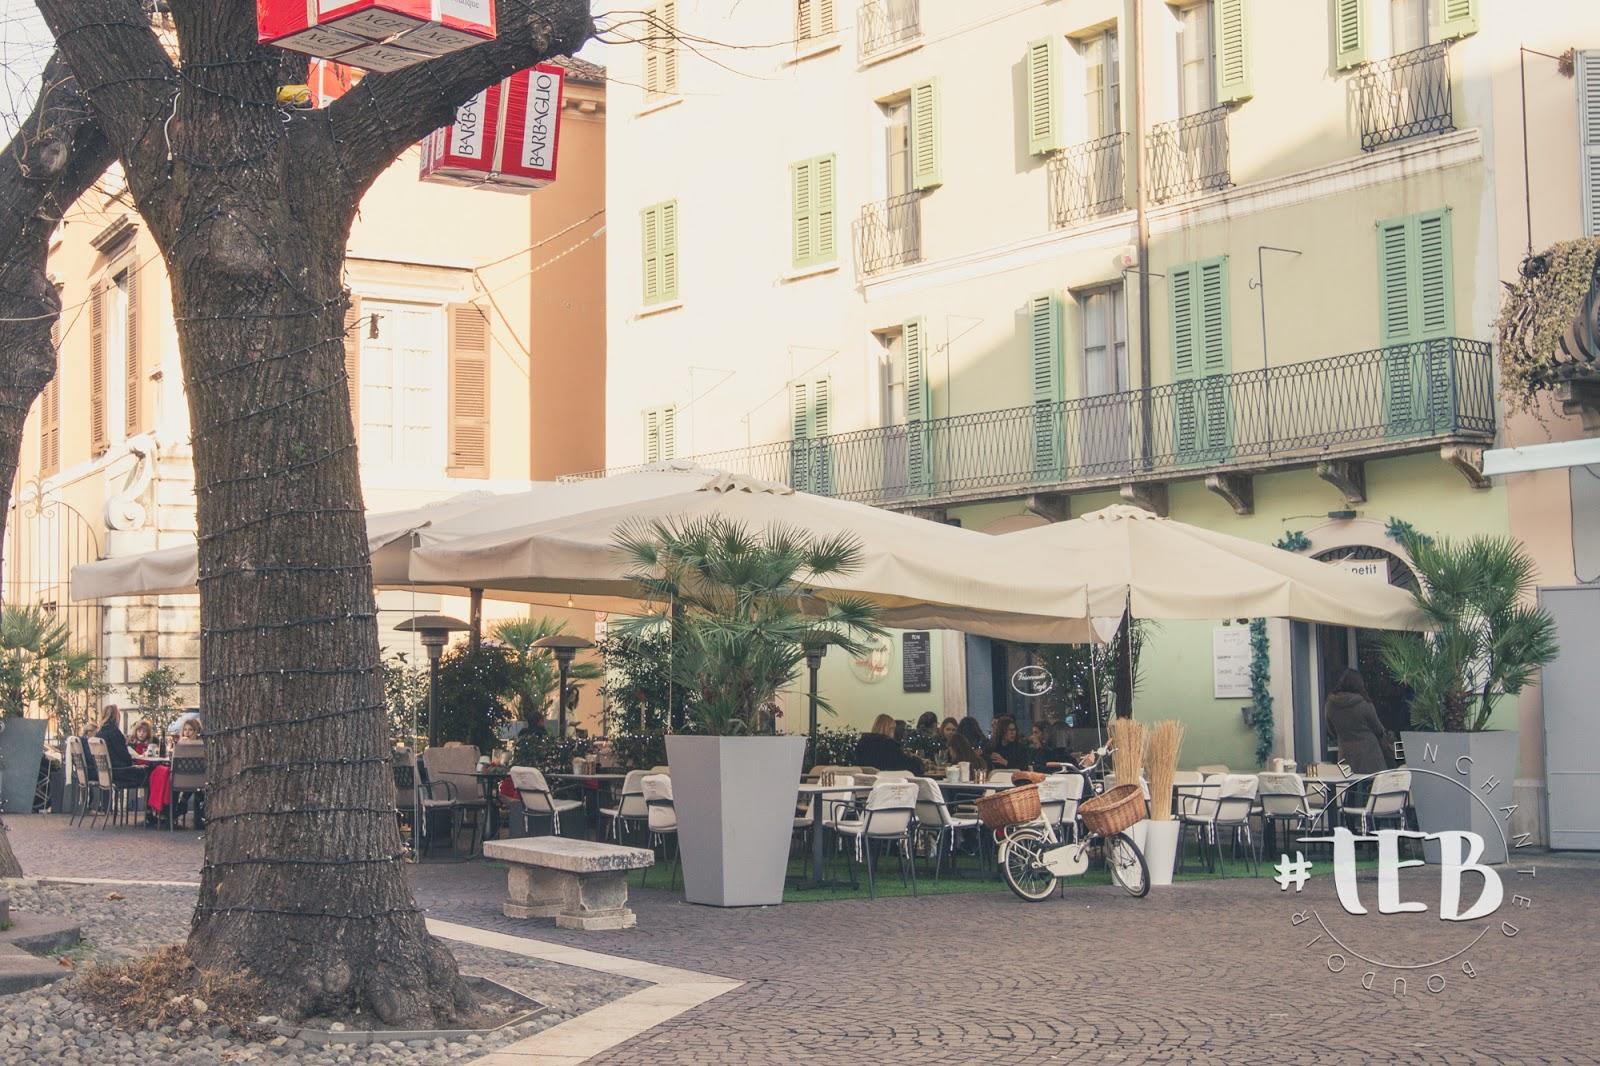 Visit Brescia tourism